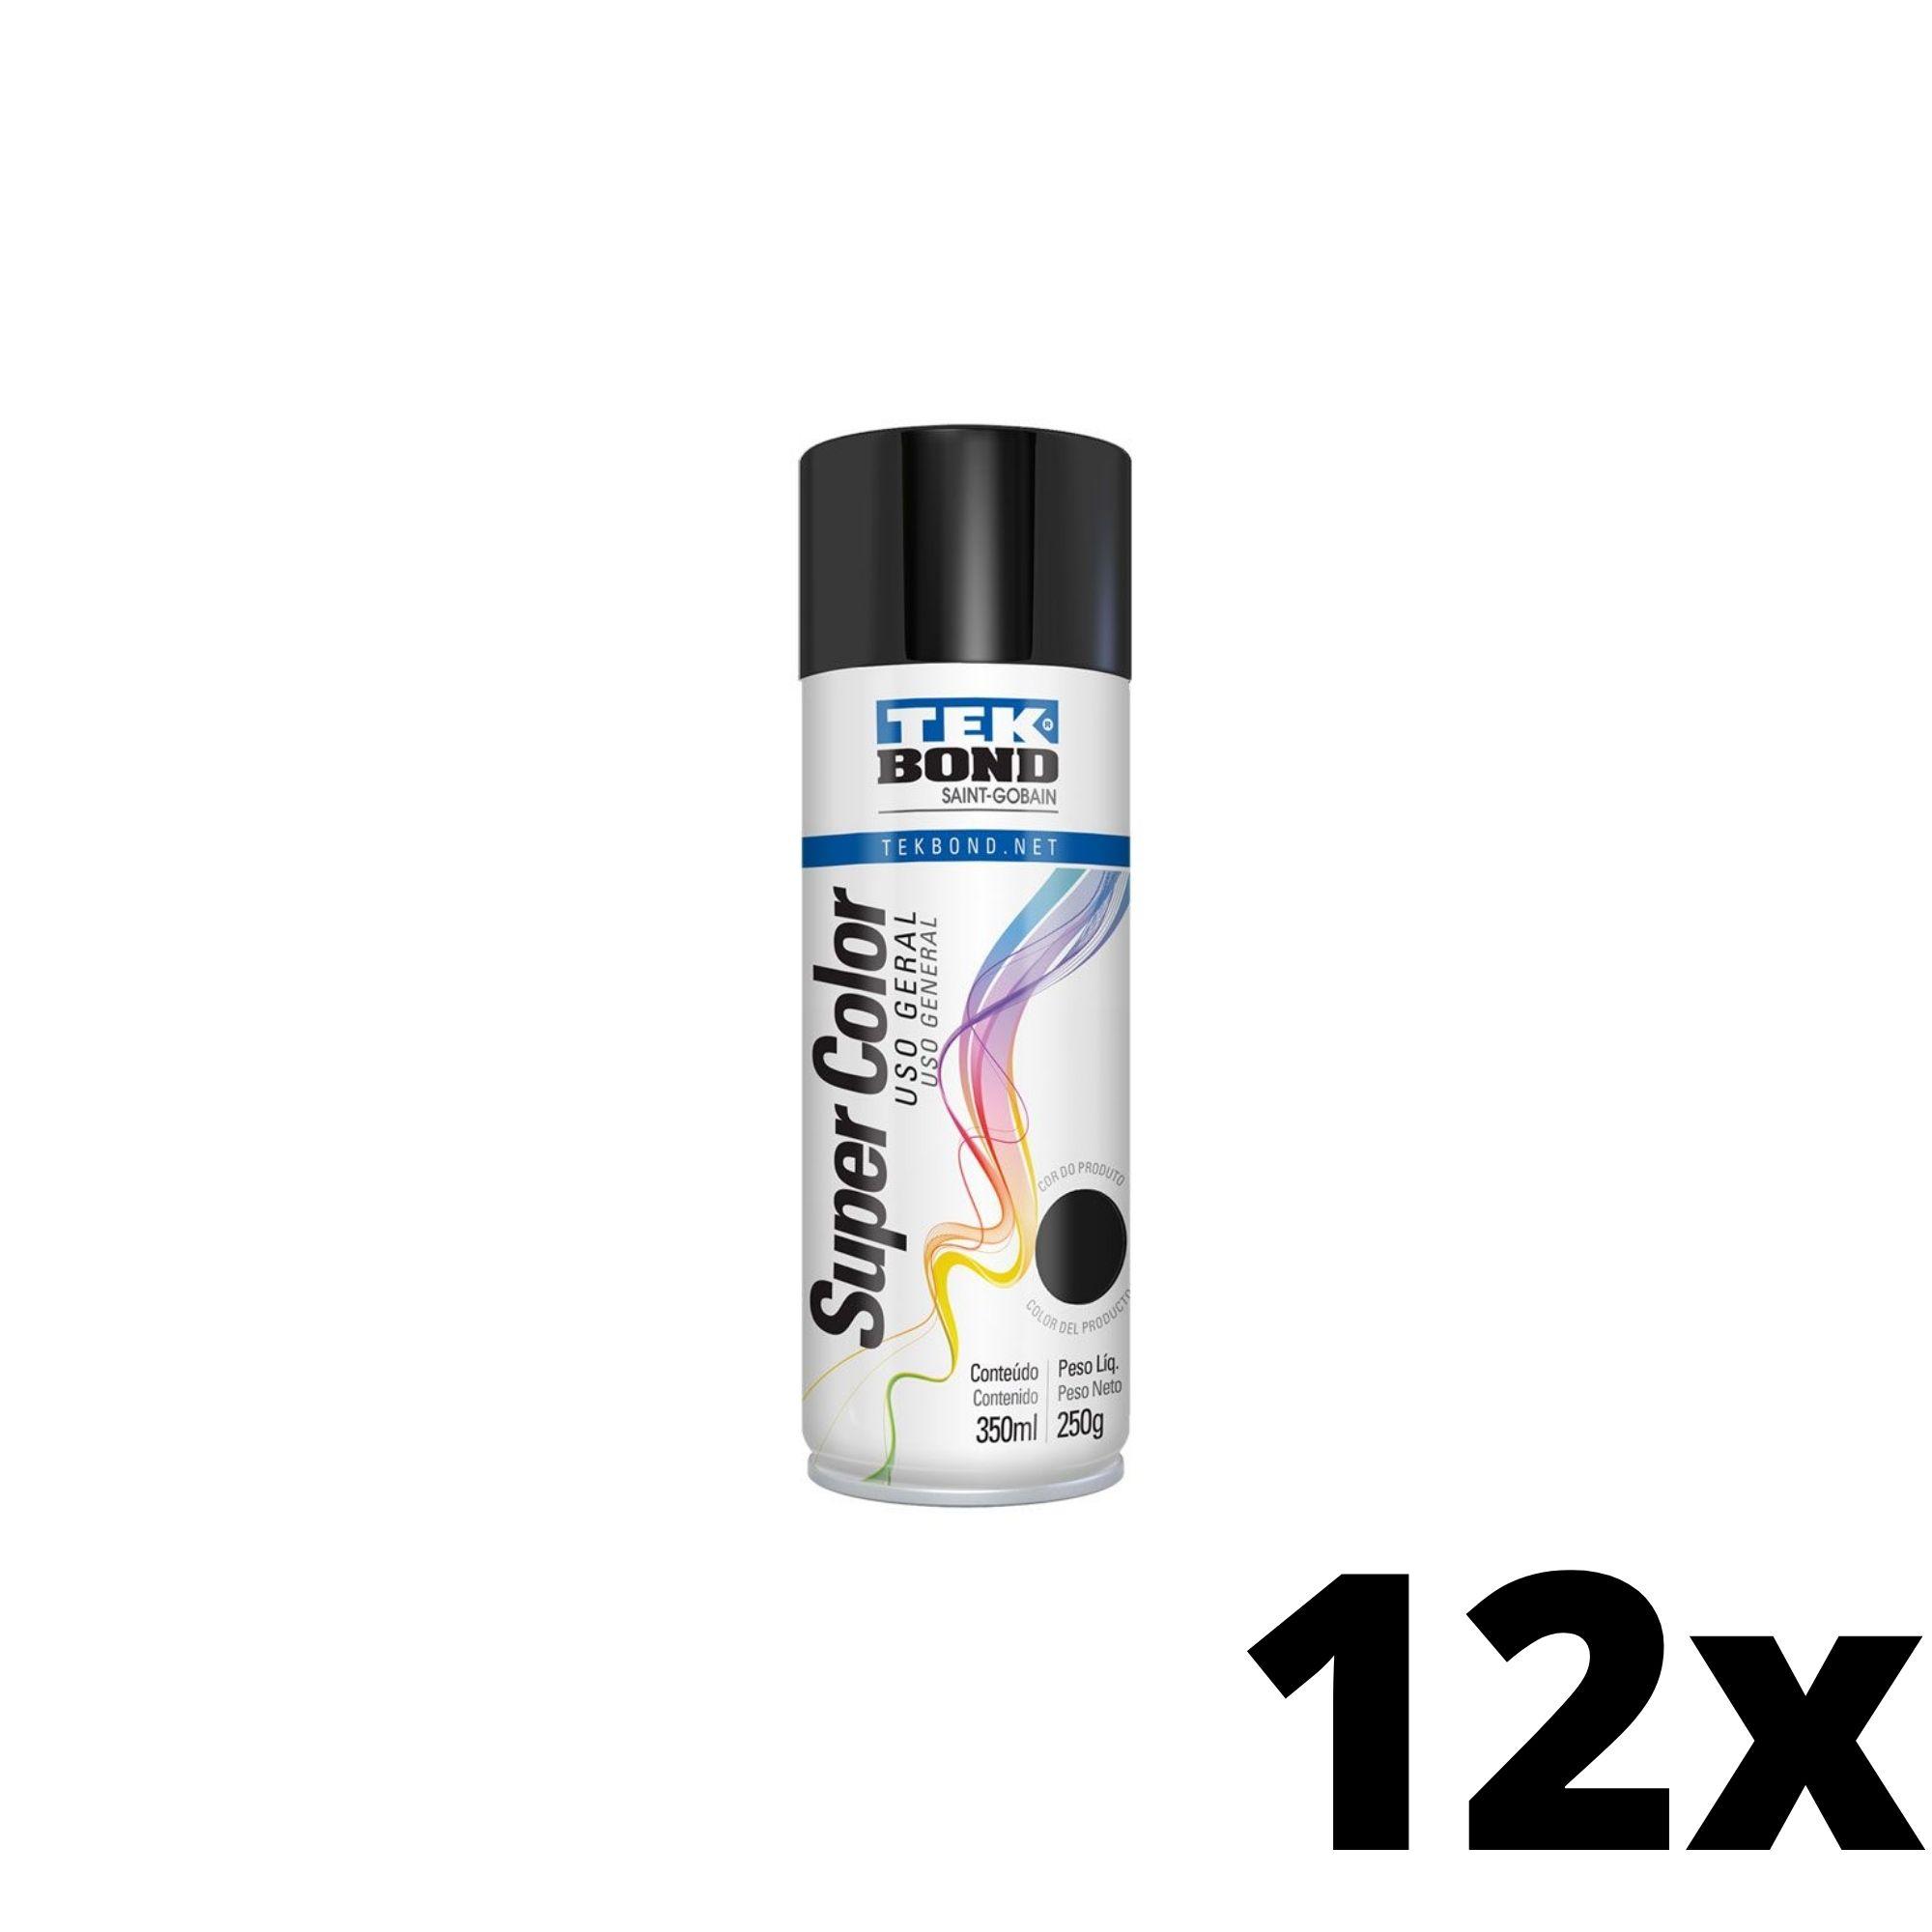 Kit 12 und Tinta Spray Preto Brilhante